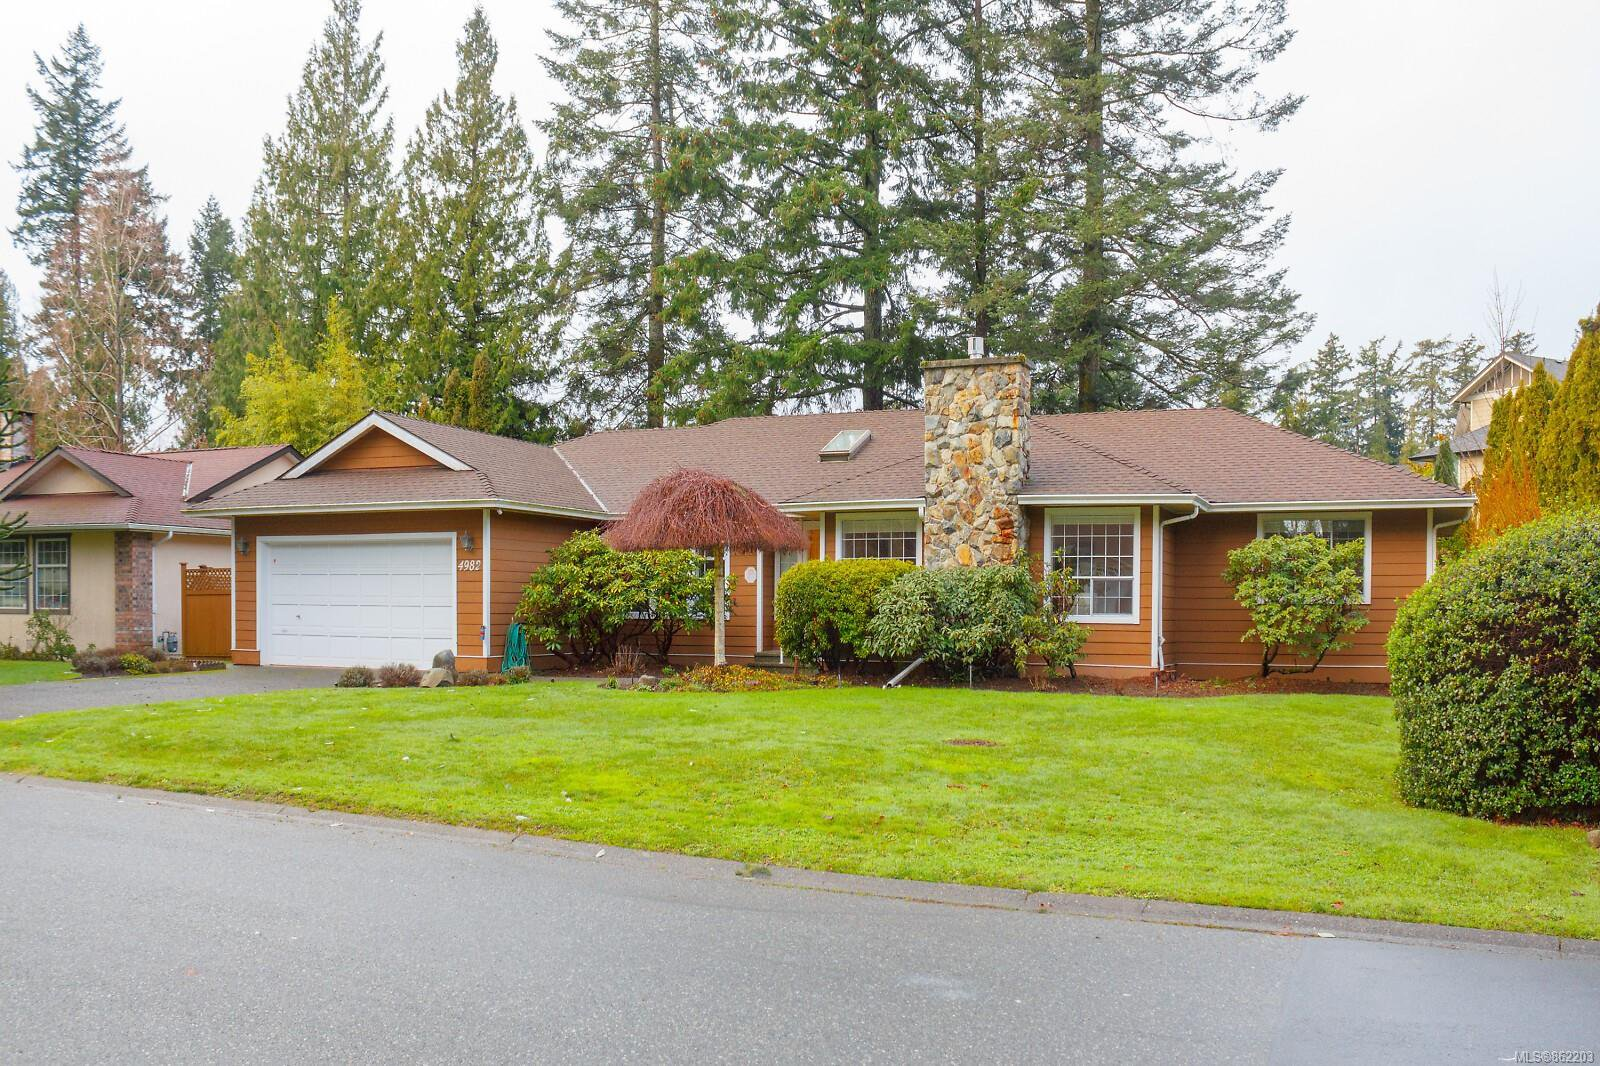 Main Photo: 4982 Del Monte Ave in : SE Cordova Bay House for sale (Saanich East)  : MLS®# 862203